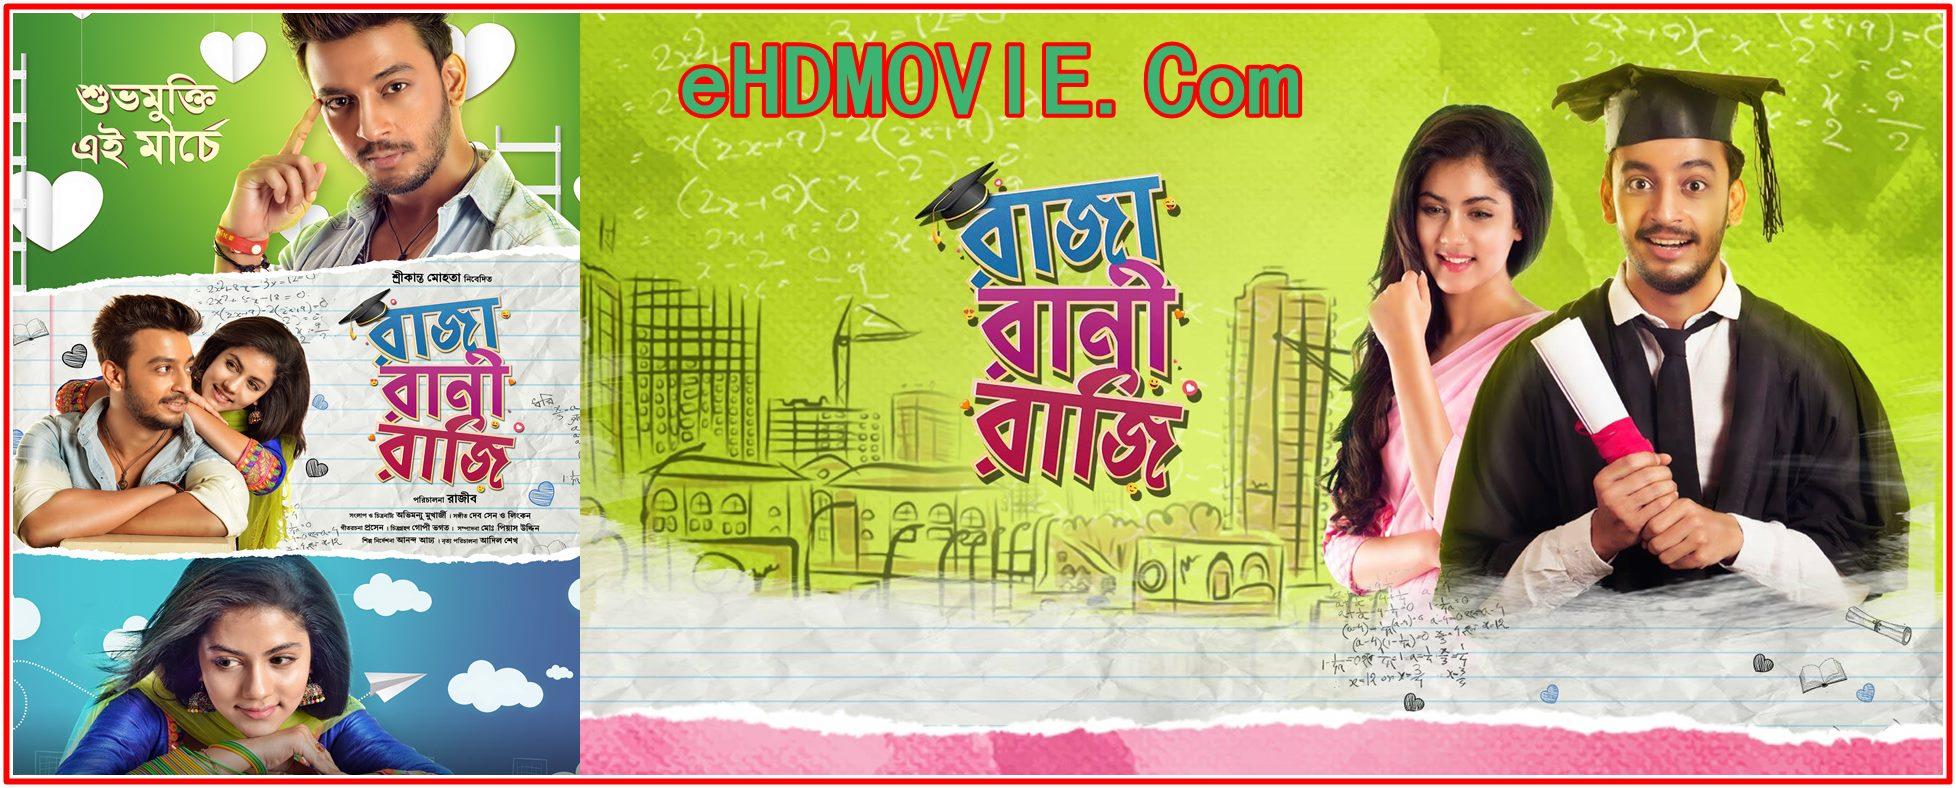 Raja Rani Raji 2018 Bengali Full Movie Original 480p - 720p ORG WEB-DL 650MB - 1GB